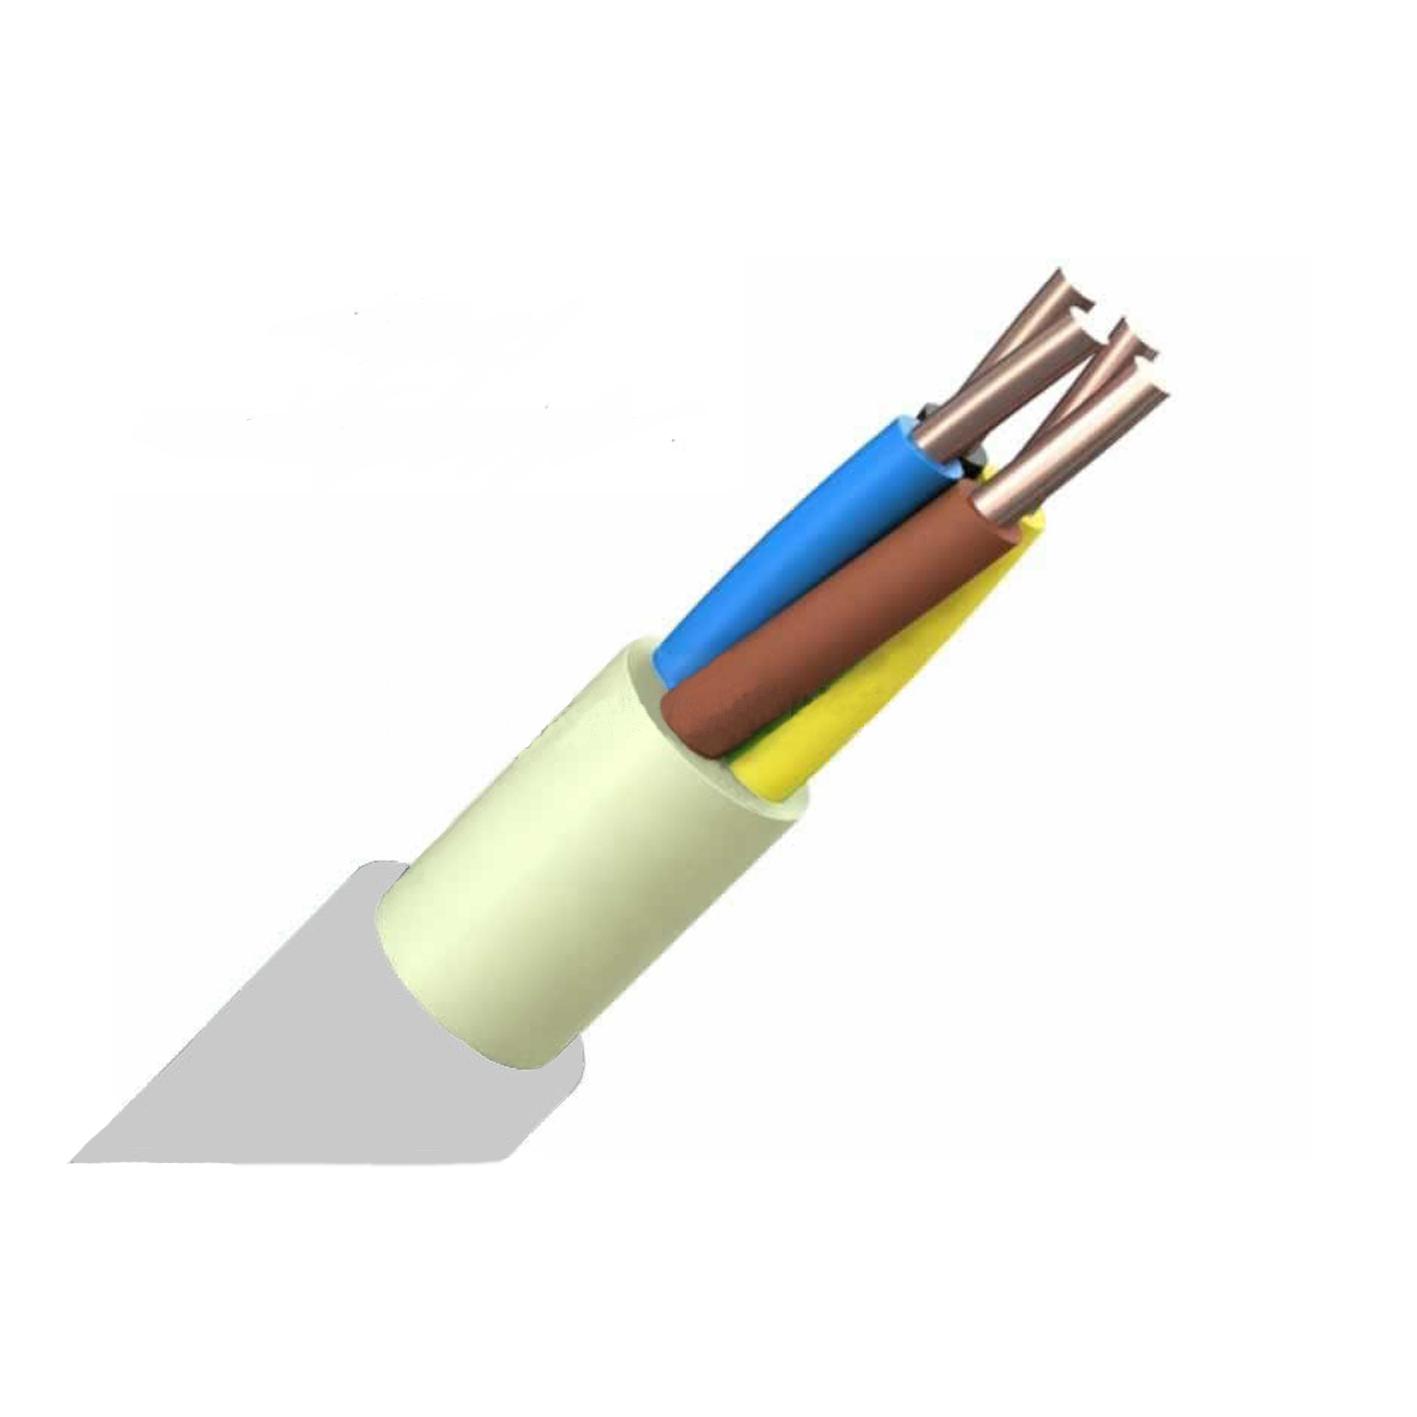 Öznur 4x10 NYM (NVV) Kablo